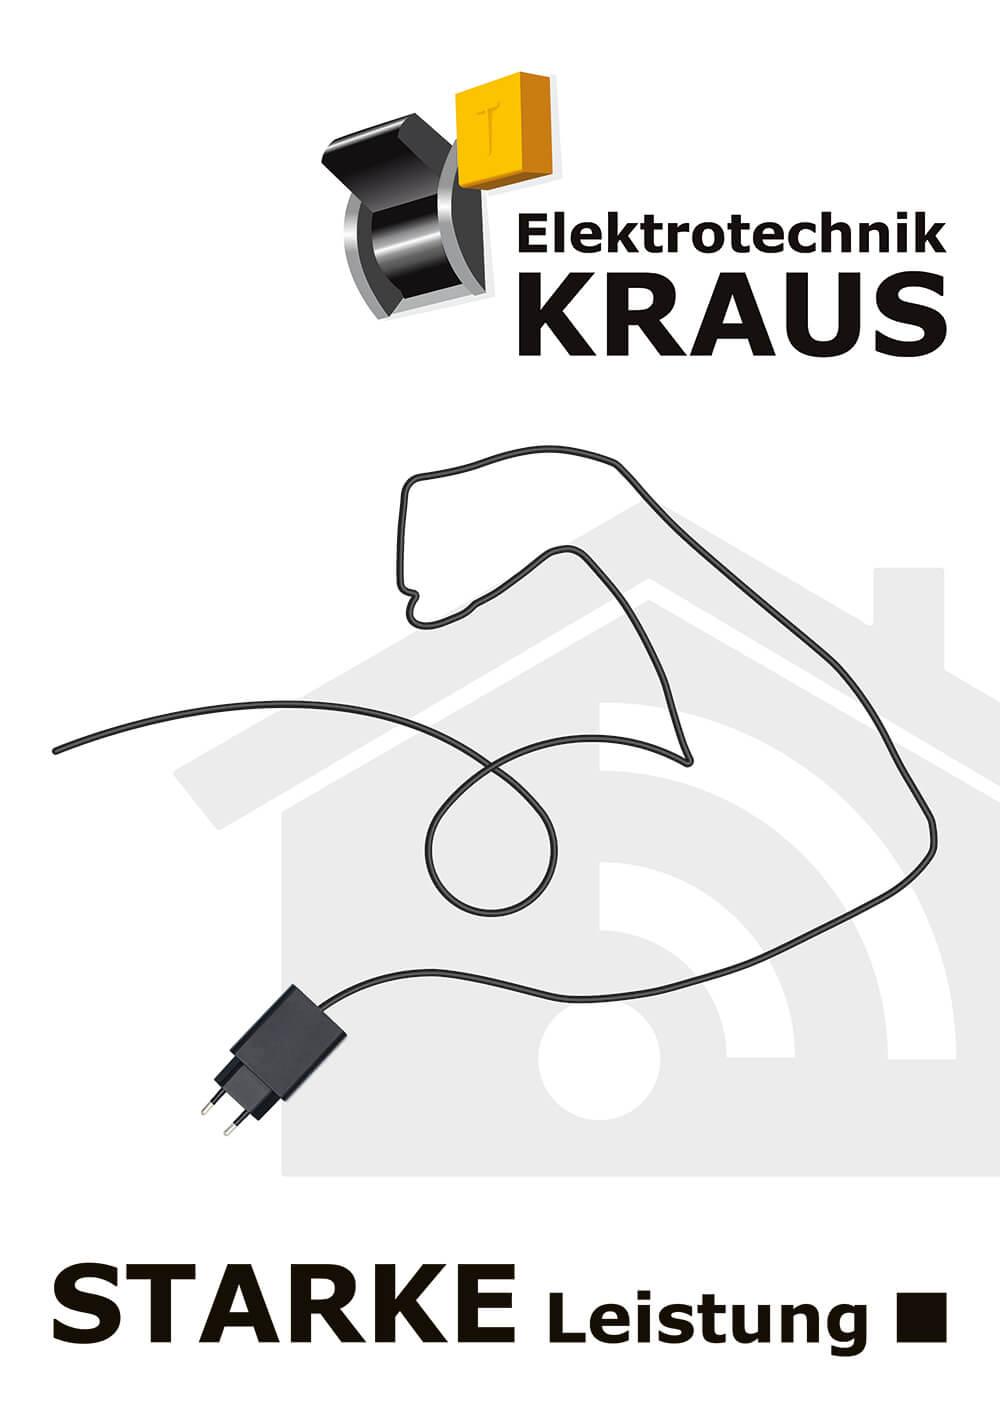 Elektrotechnik Kraus Starke Leistung